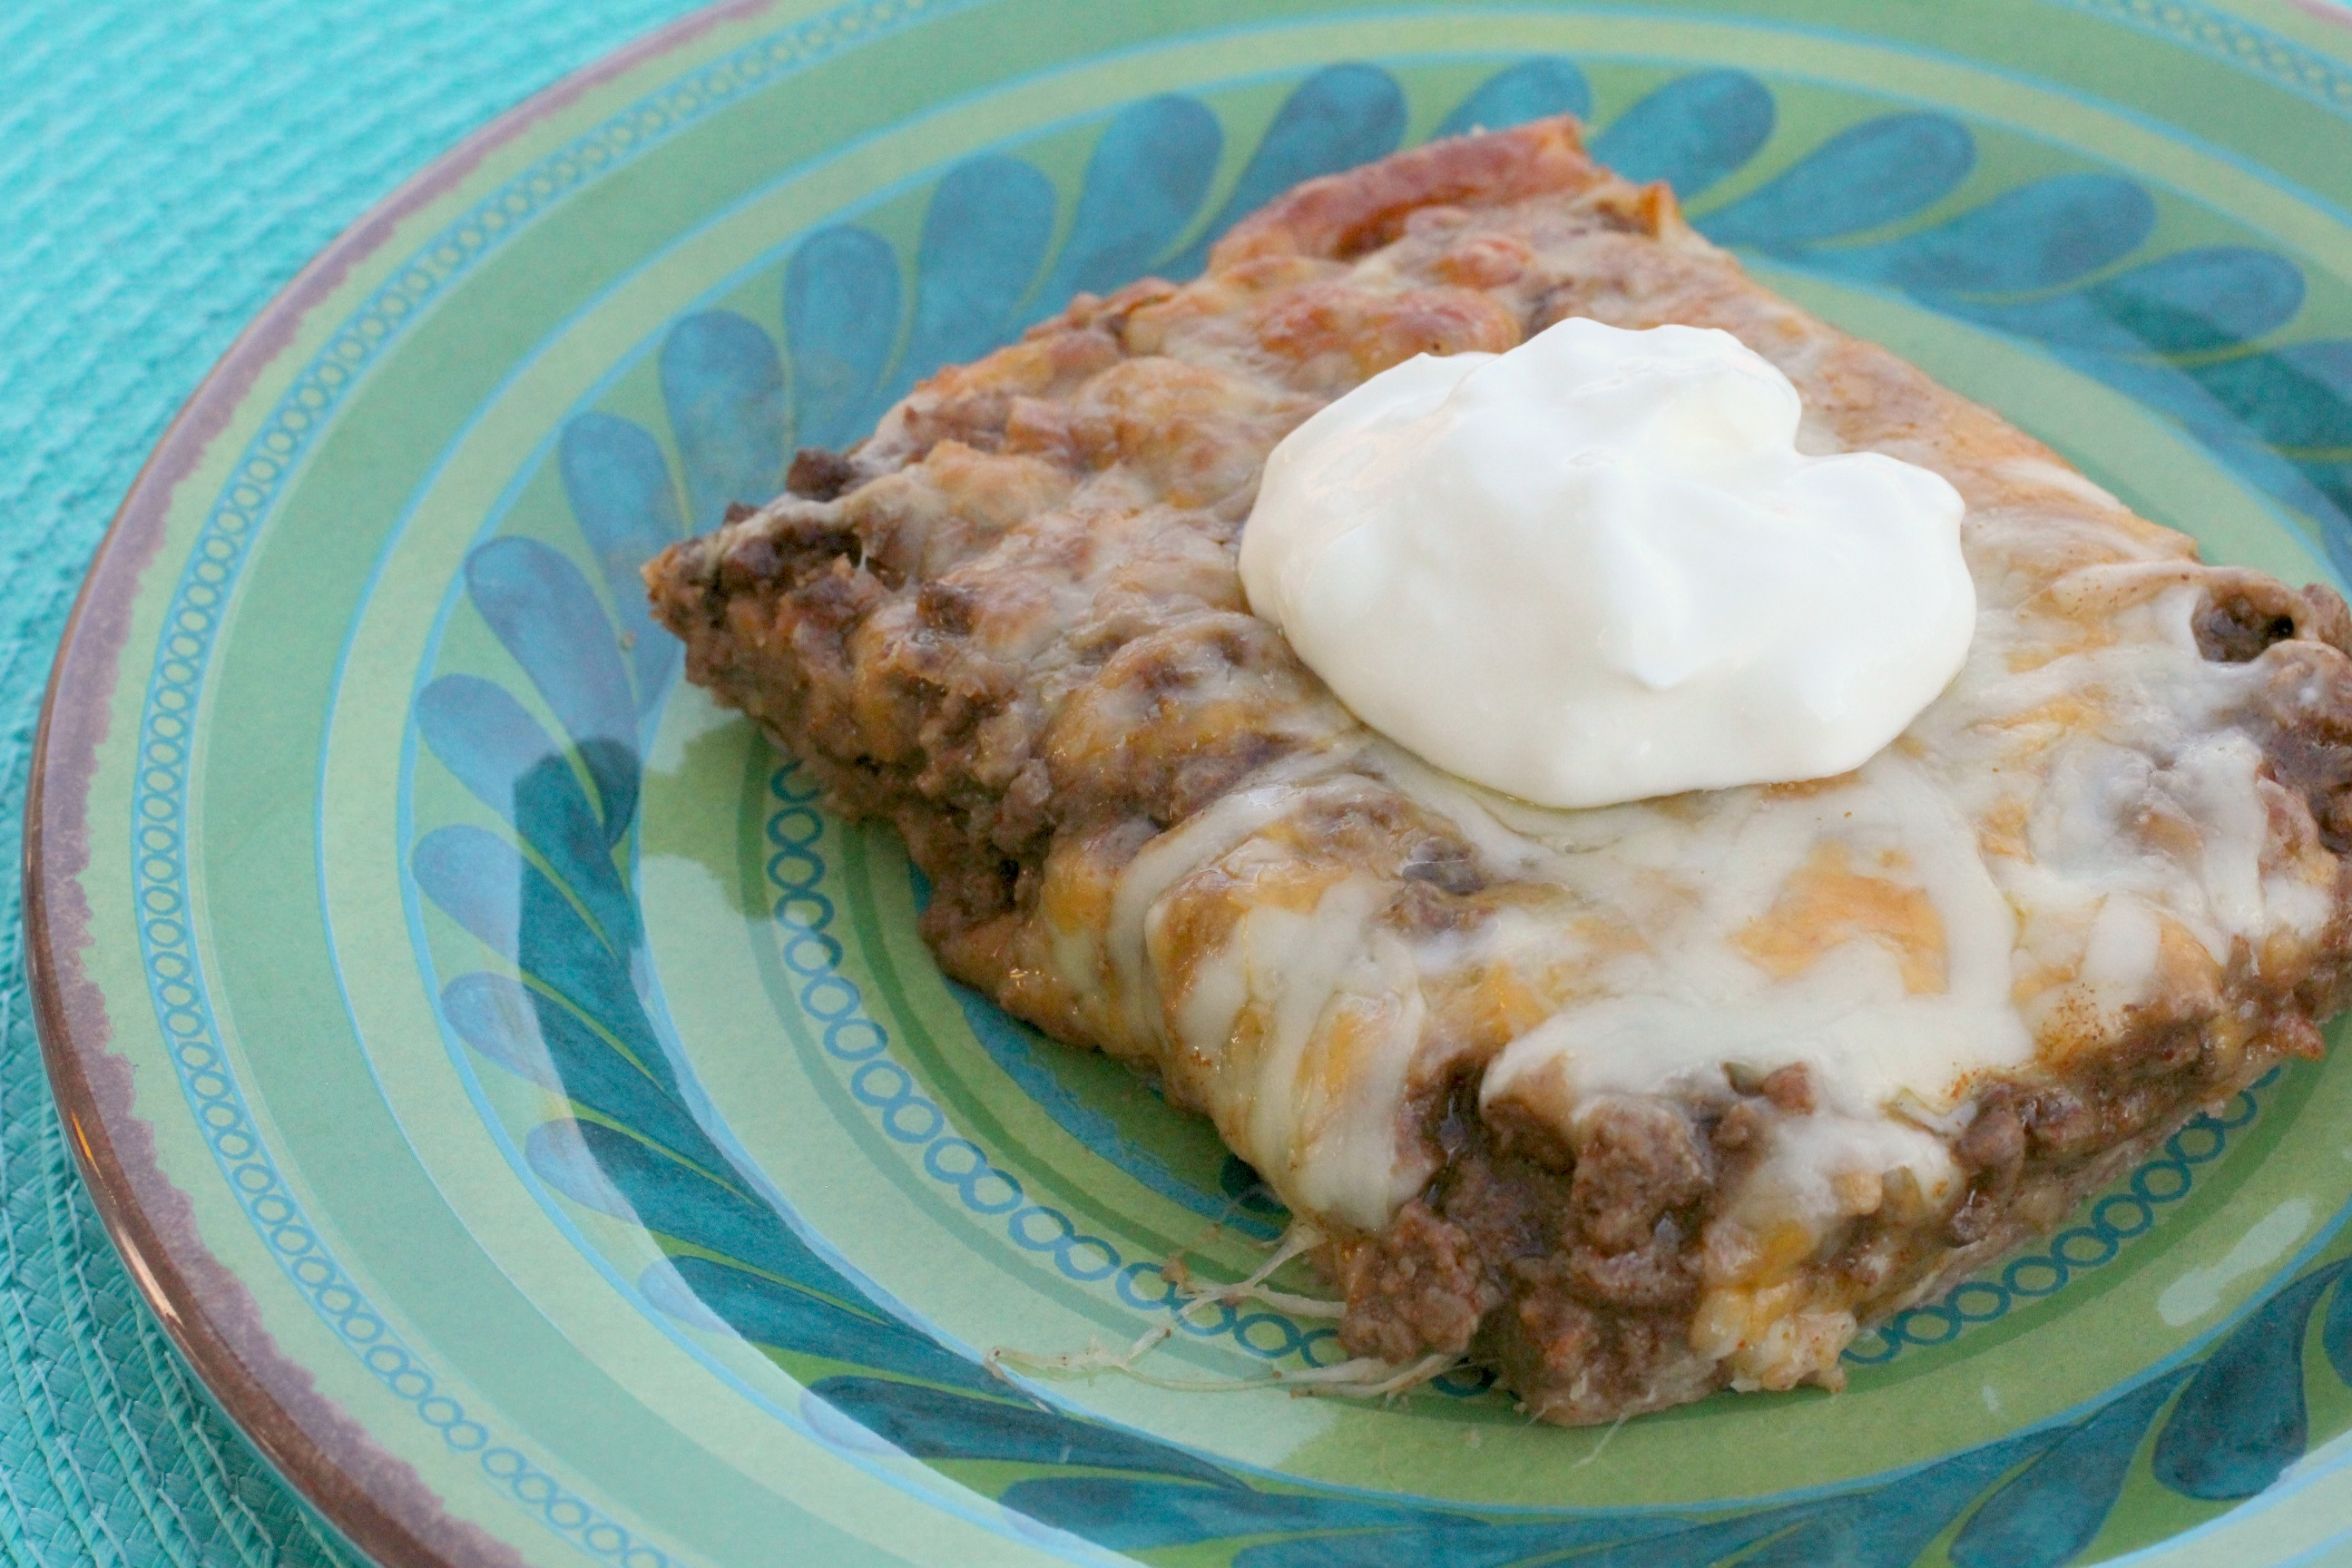 Burrito Bake 2